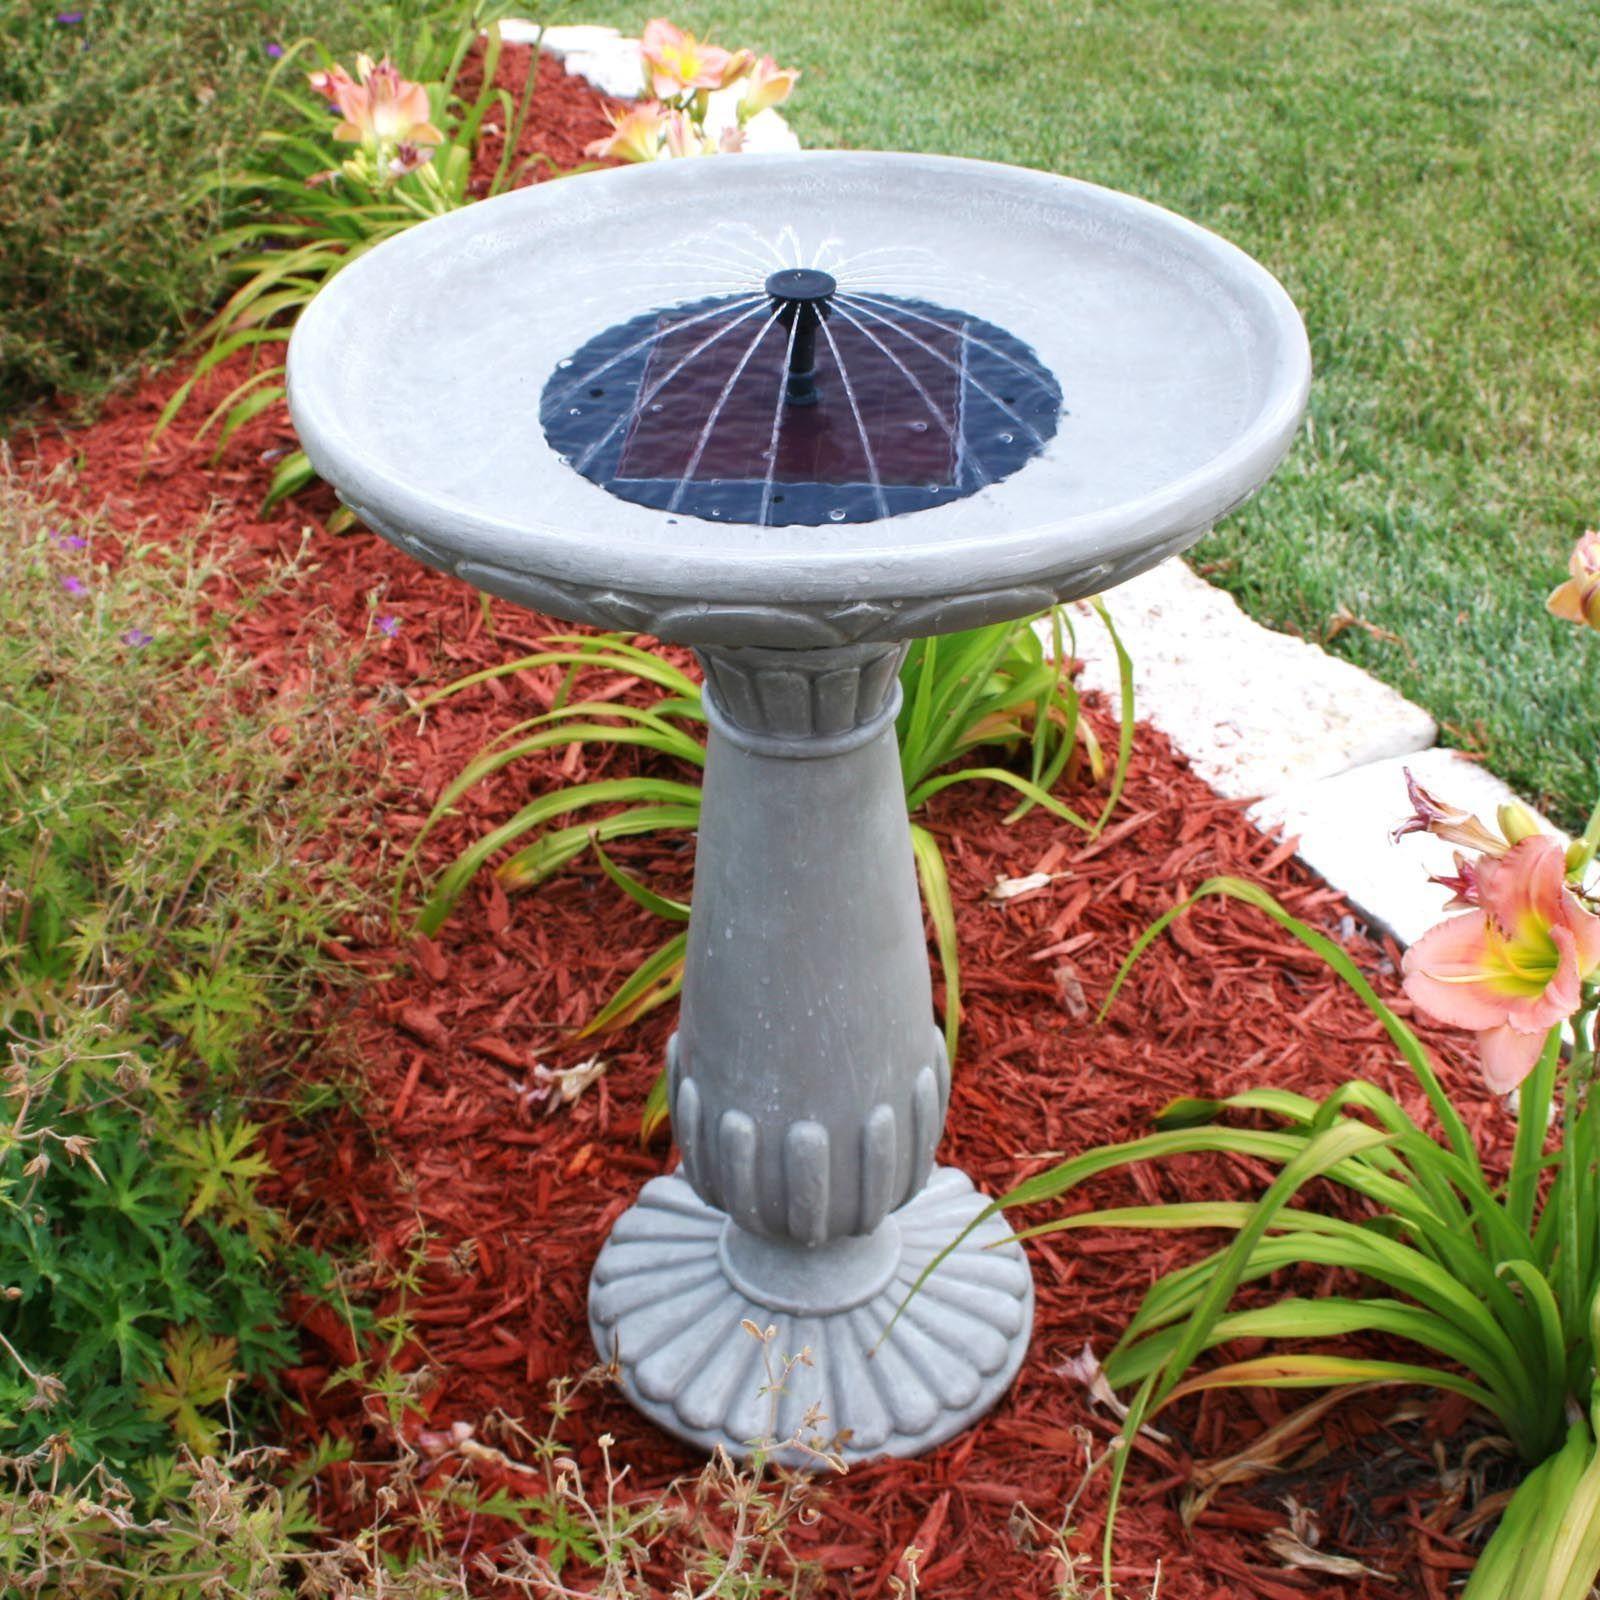 Diy solar heated bird bath solar bird bath solar